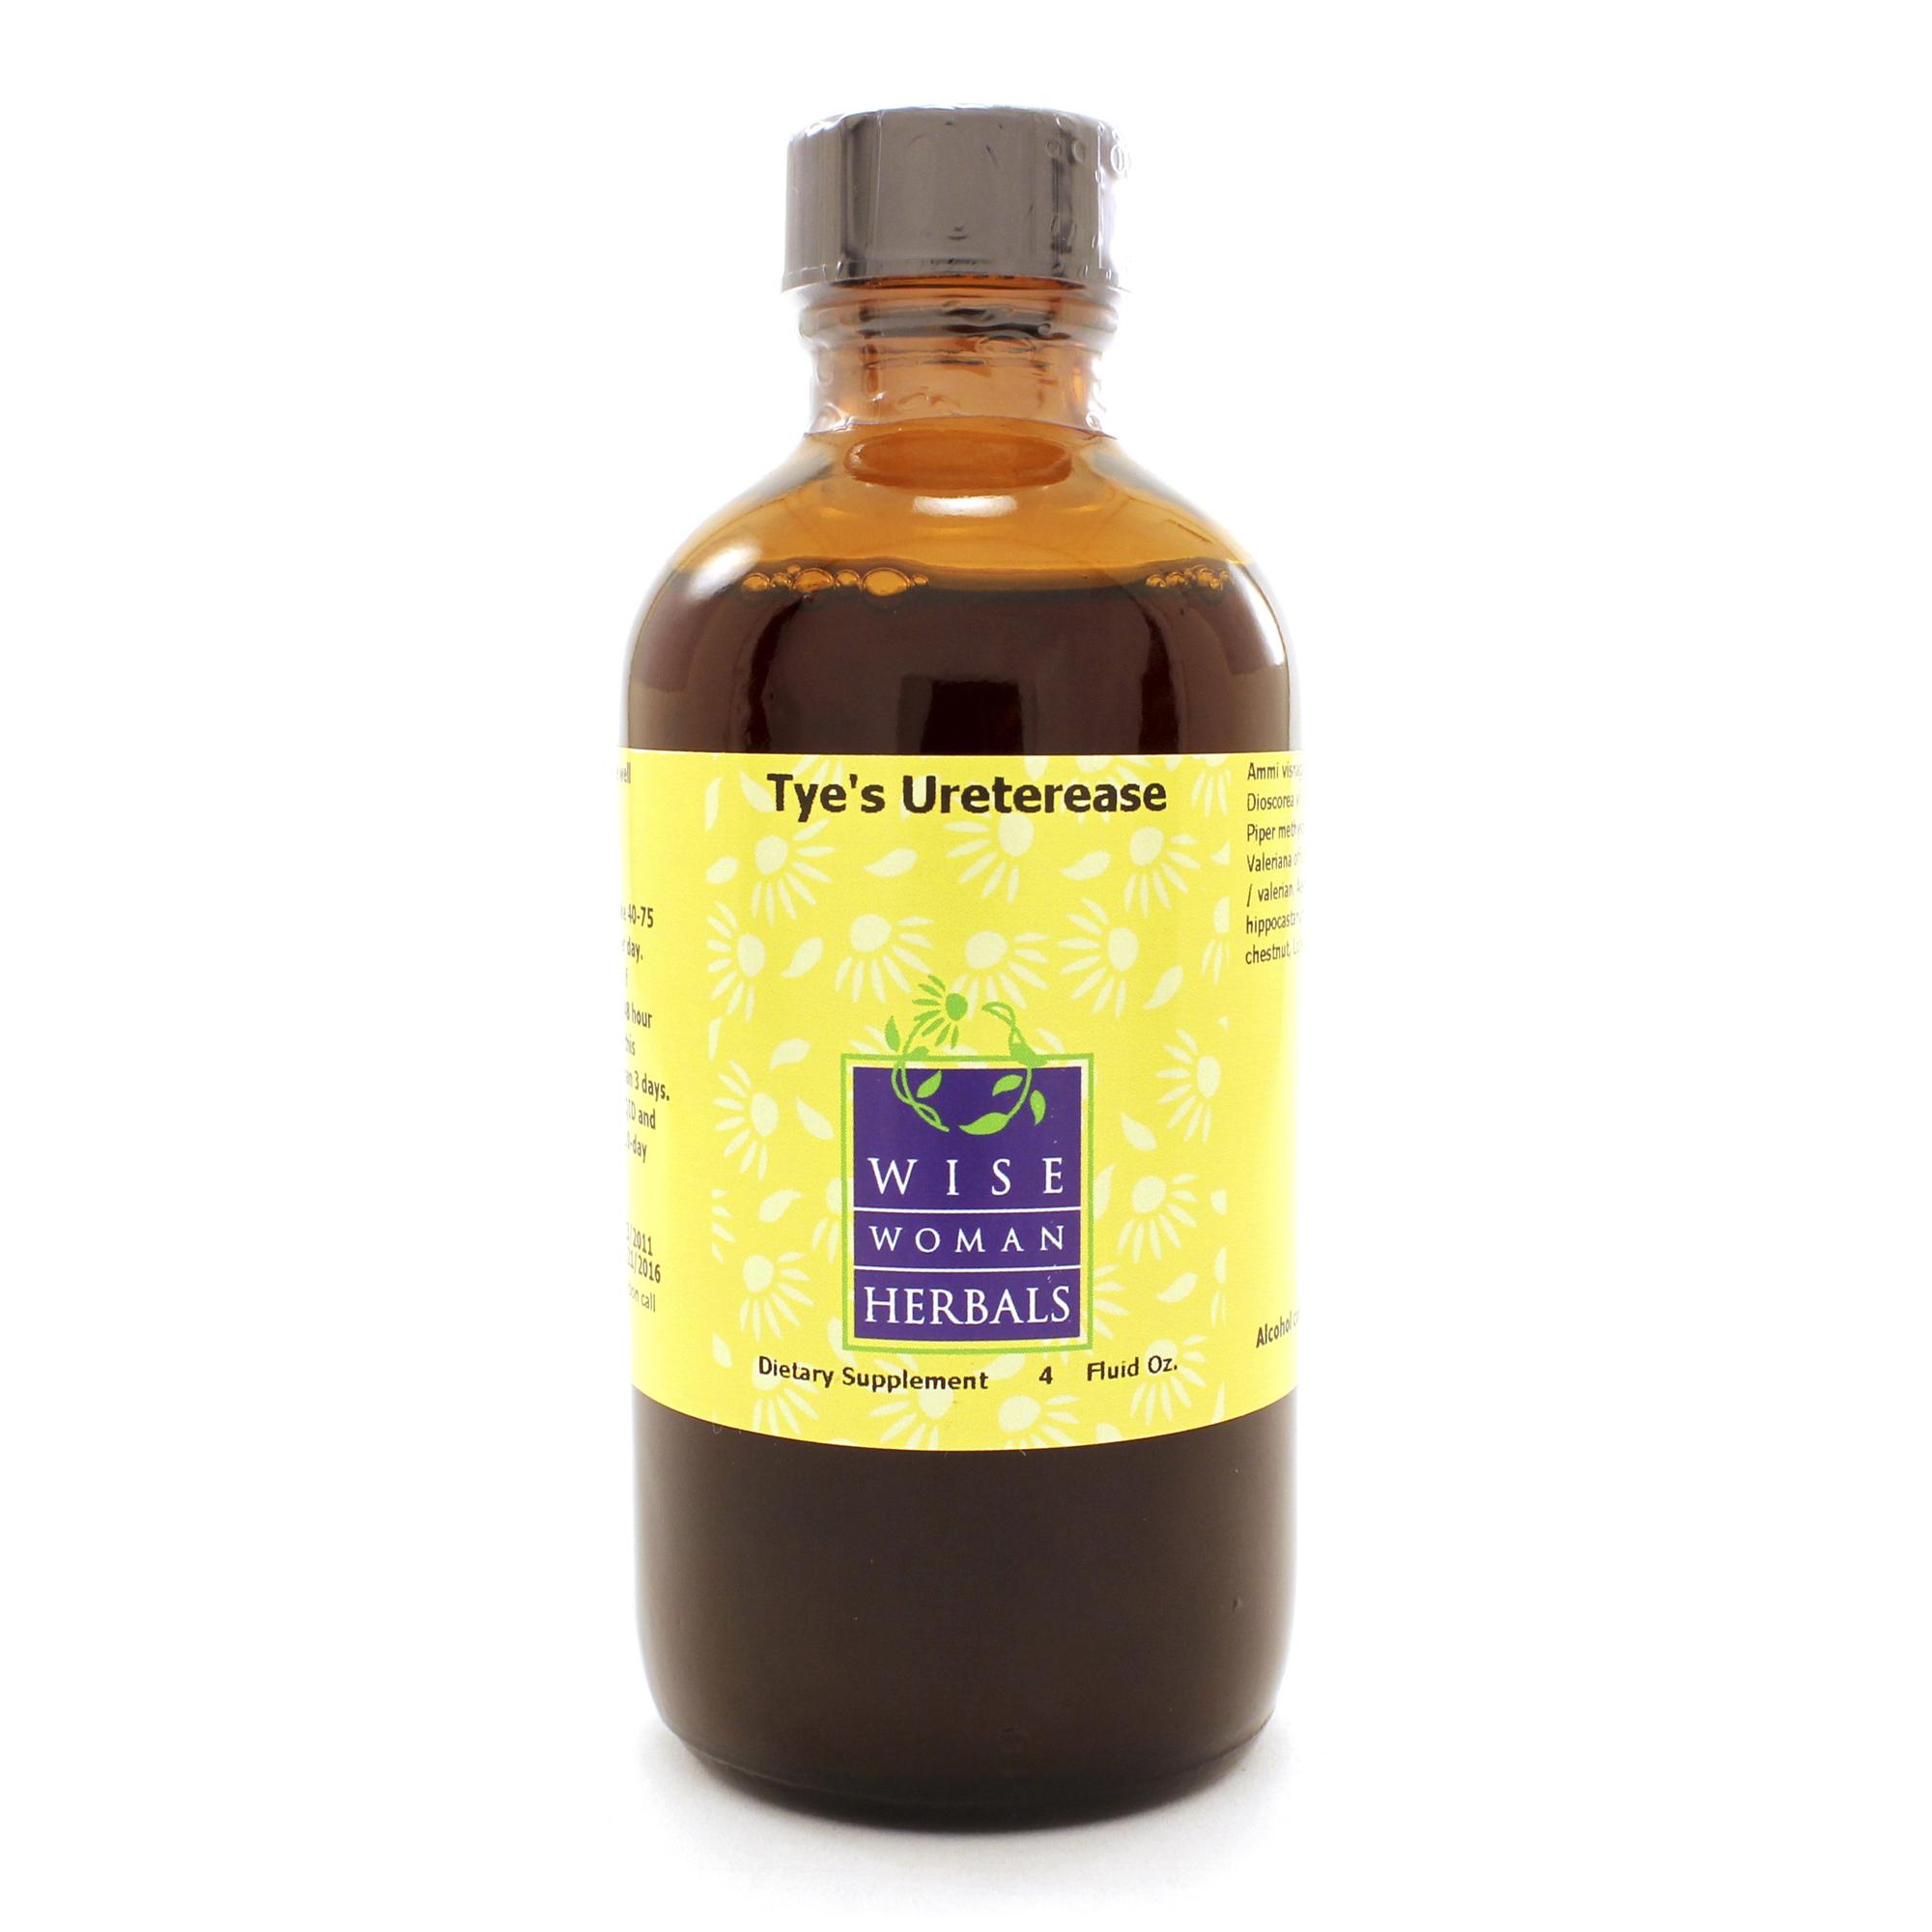 Wise Woman Herbals Ureterease 4oz (Custom Formula)